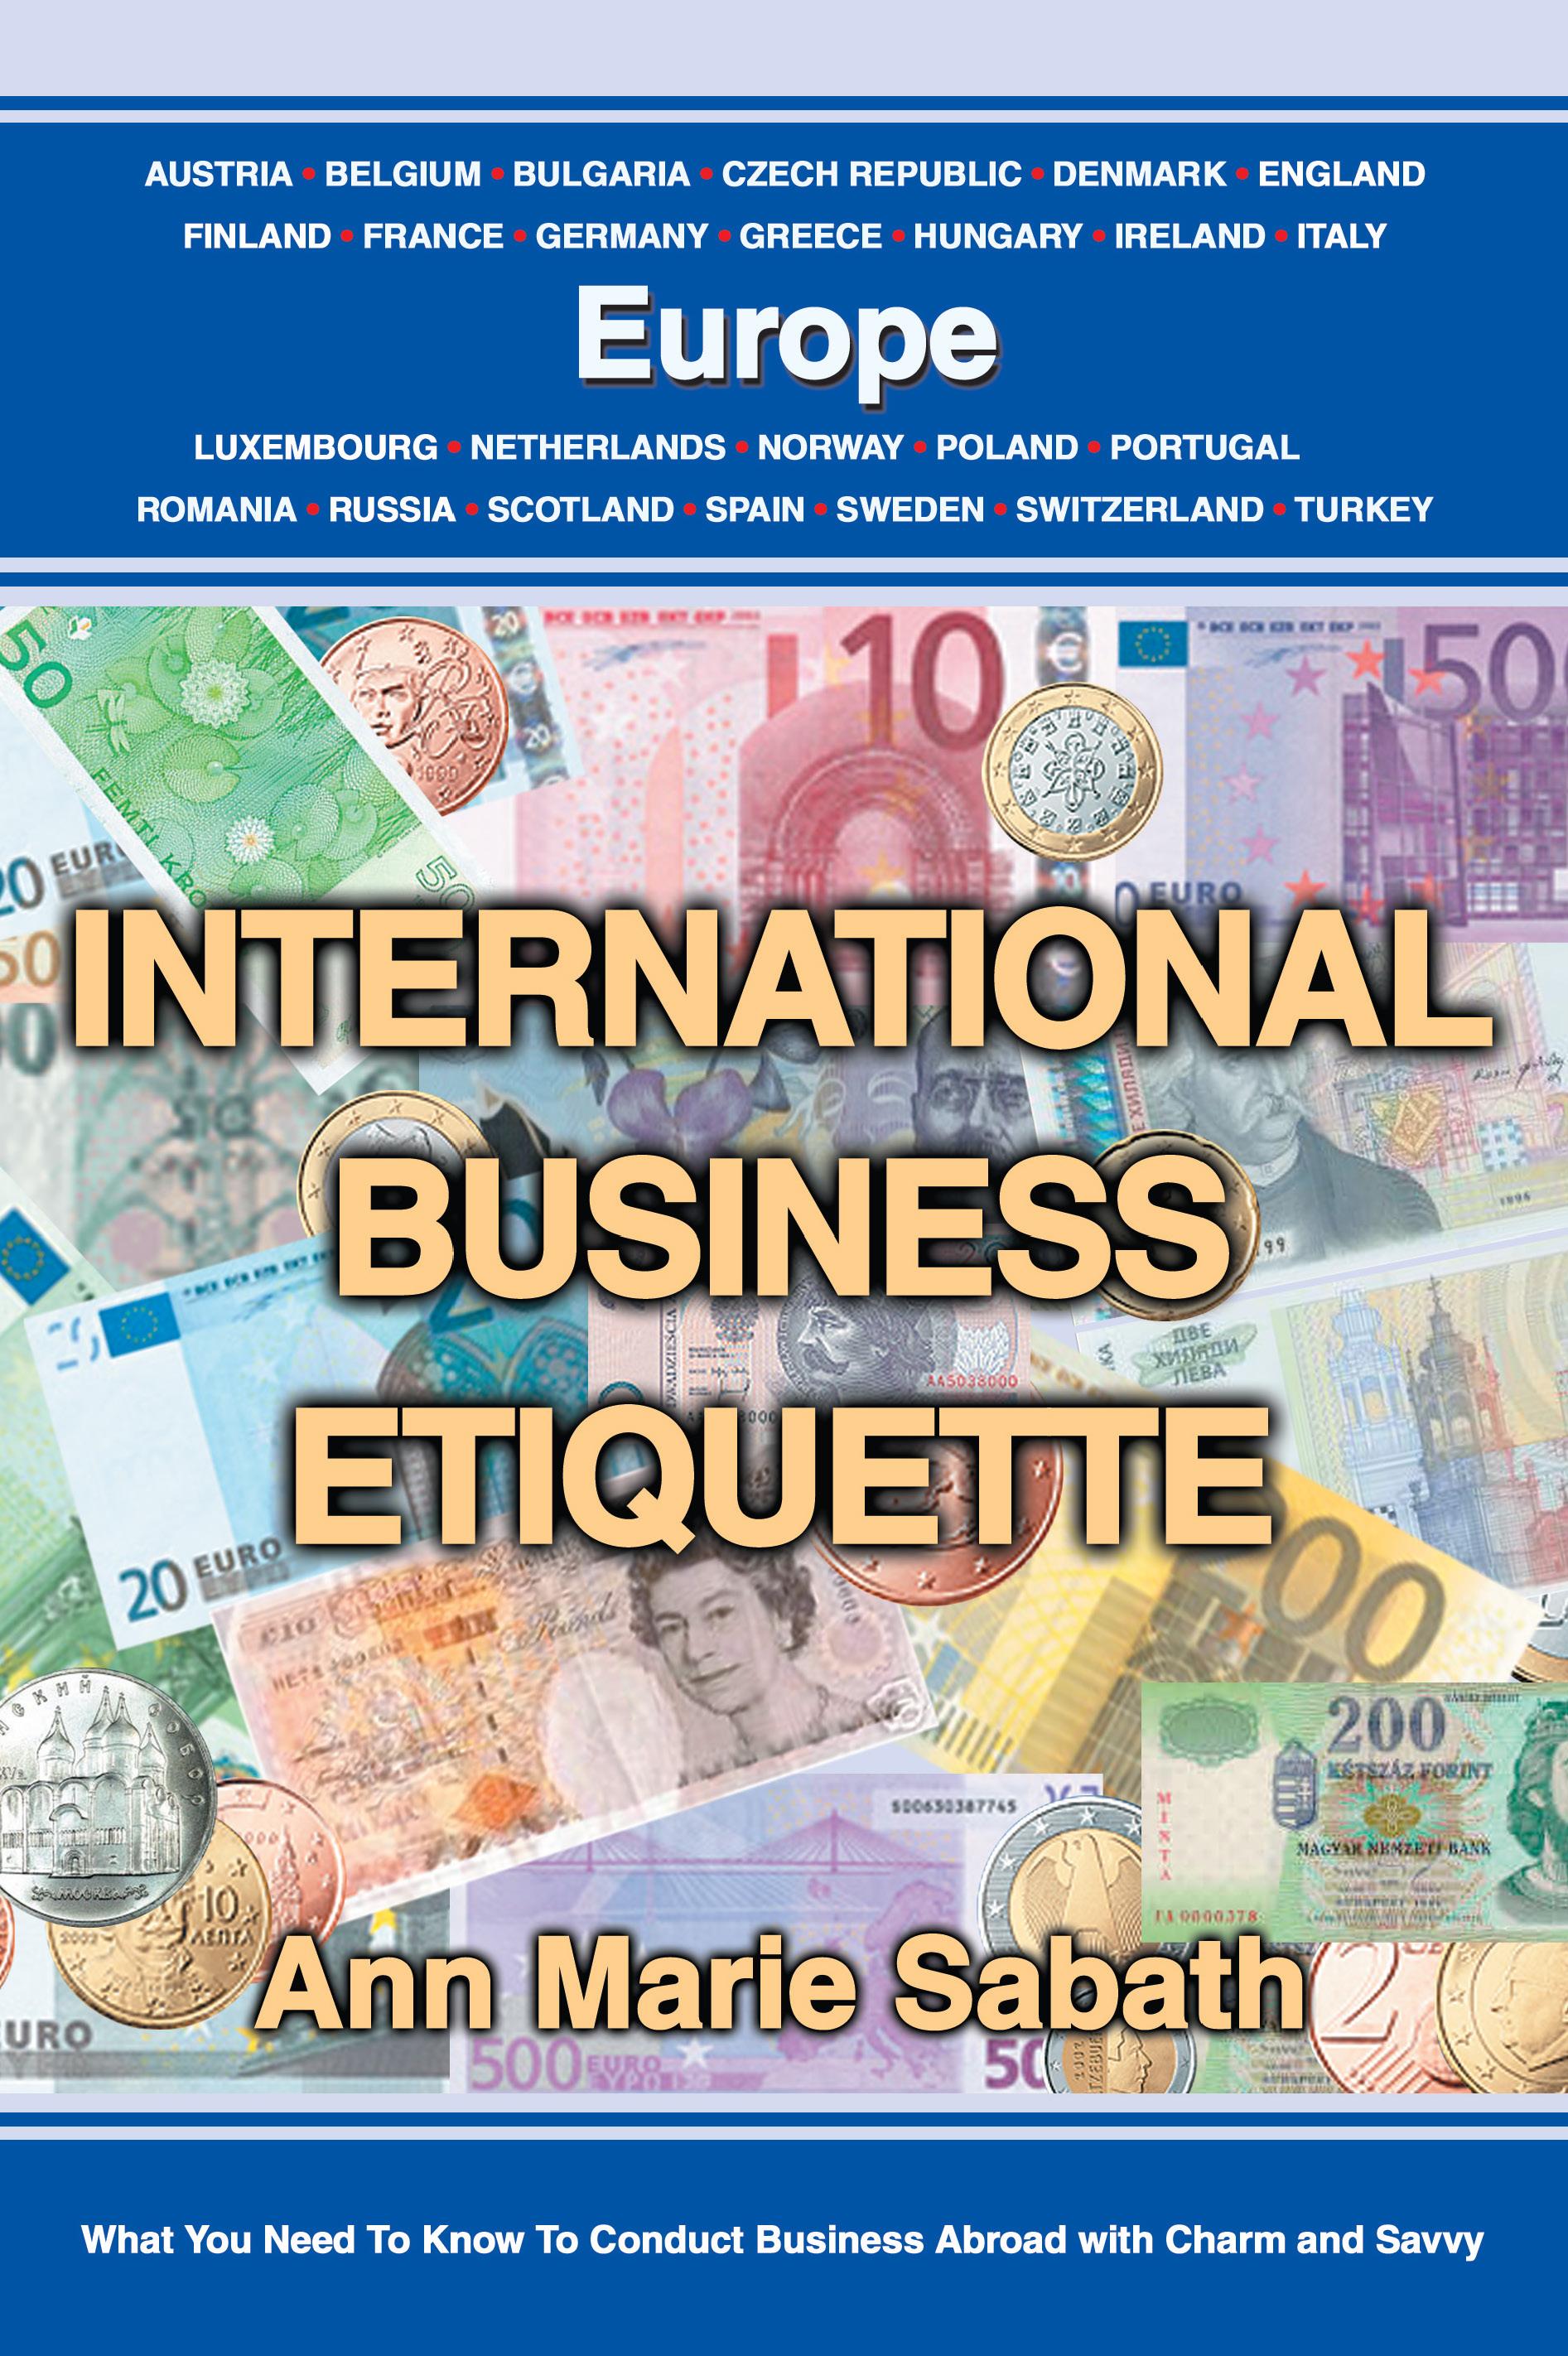 International business etiquette europe ann marie sabath reheart Image collections